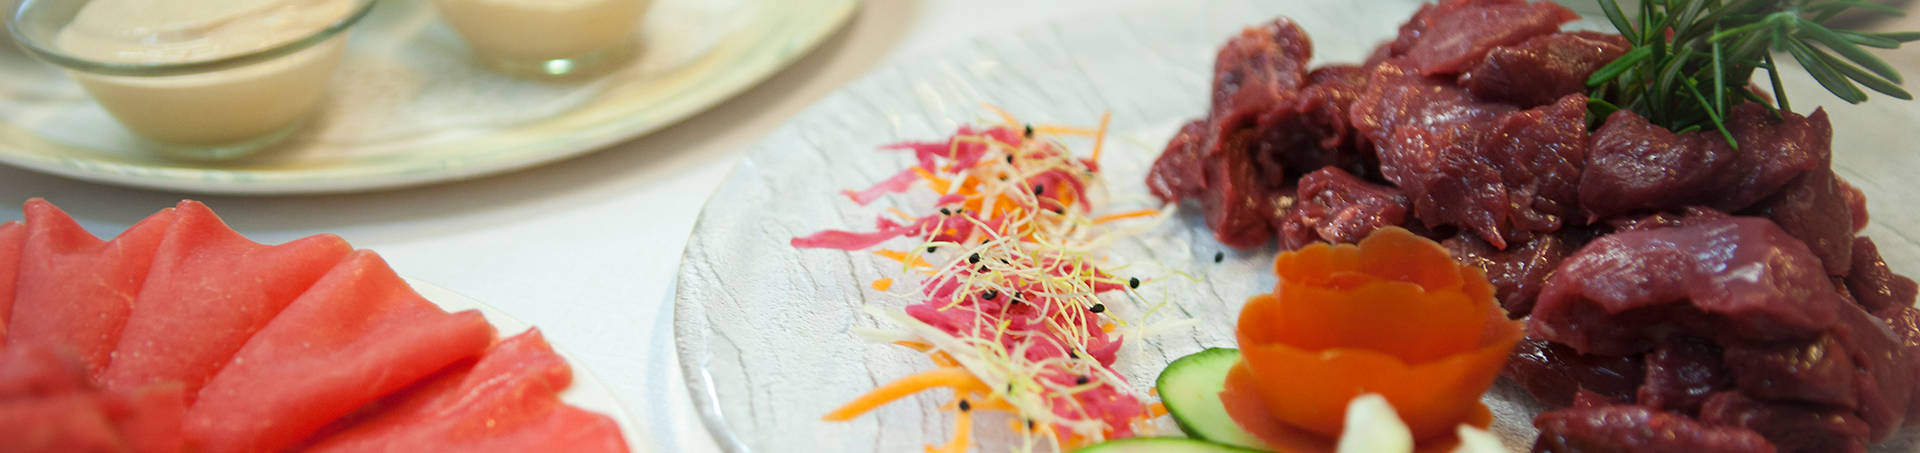 fondue-leman-restorive-3-restaurants-nyon